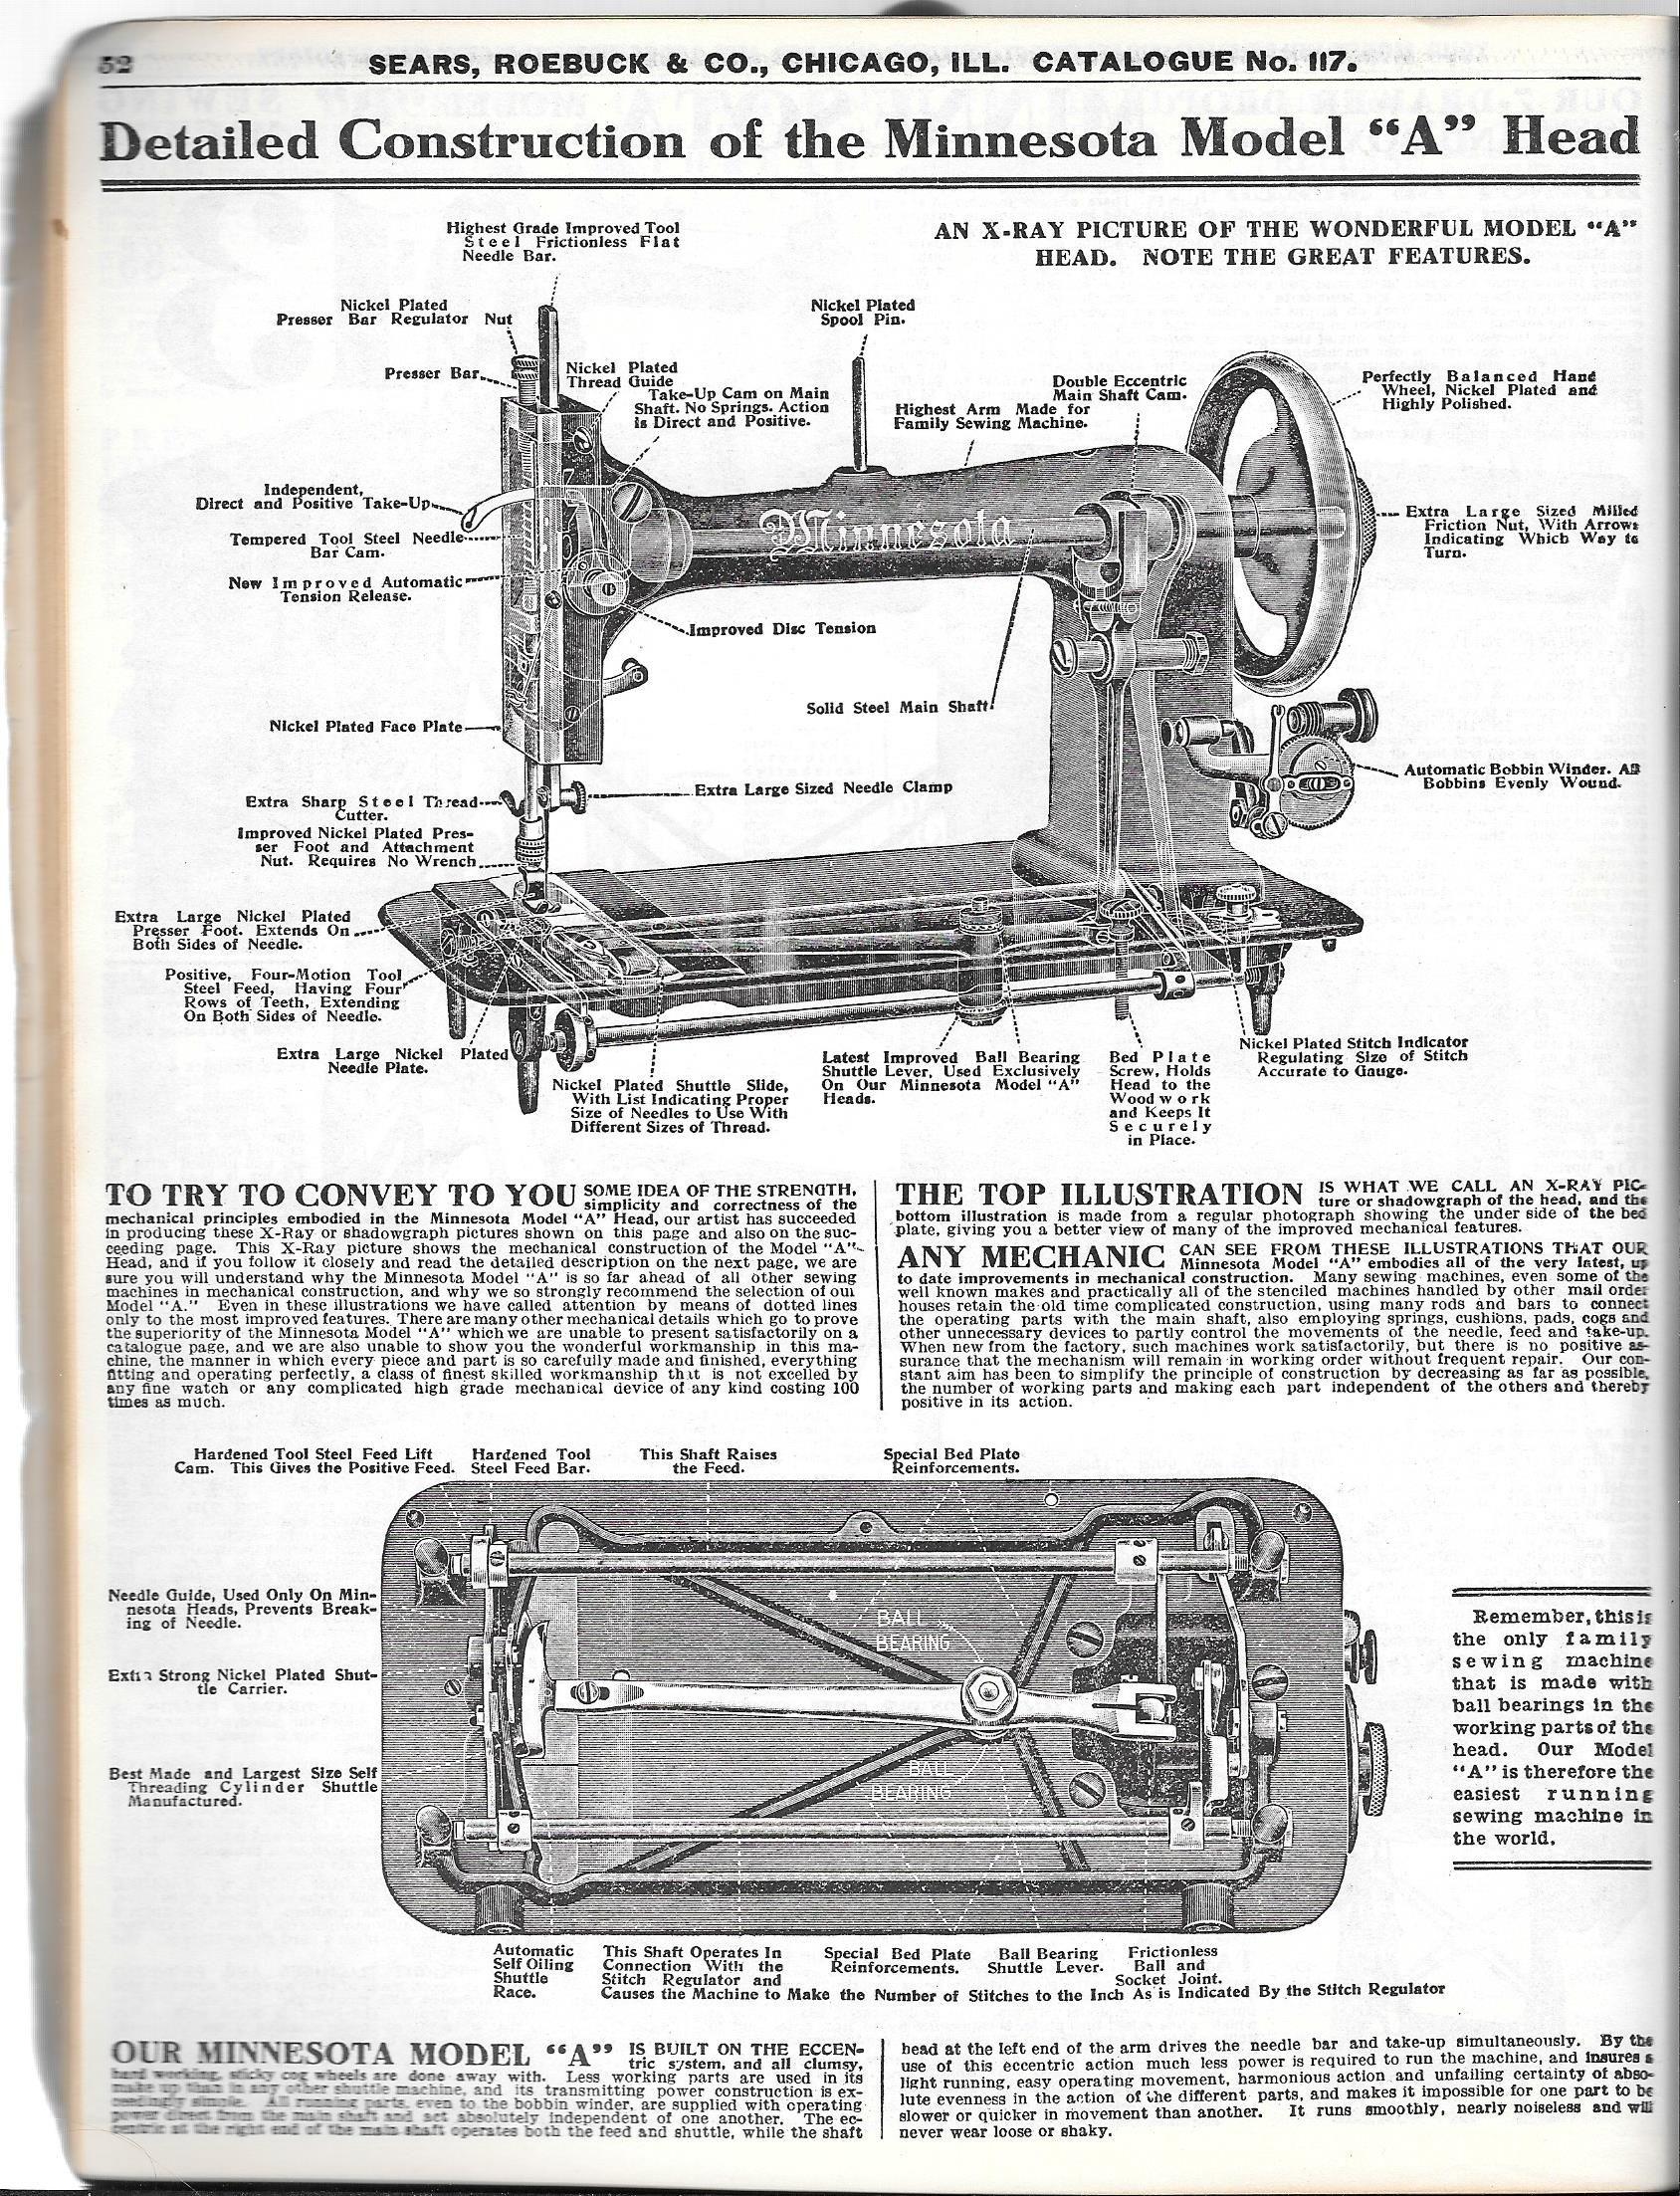 Minnesota treadle machine Sewing machine repair, Sewing